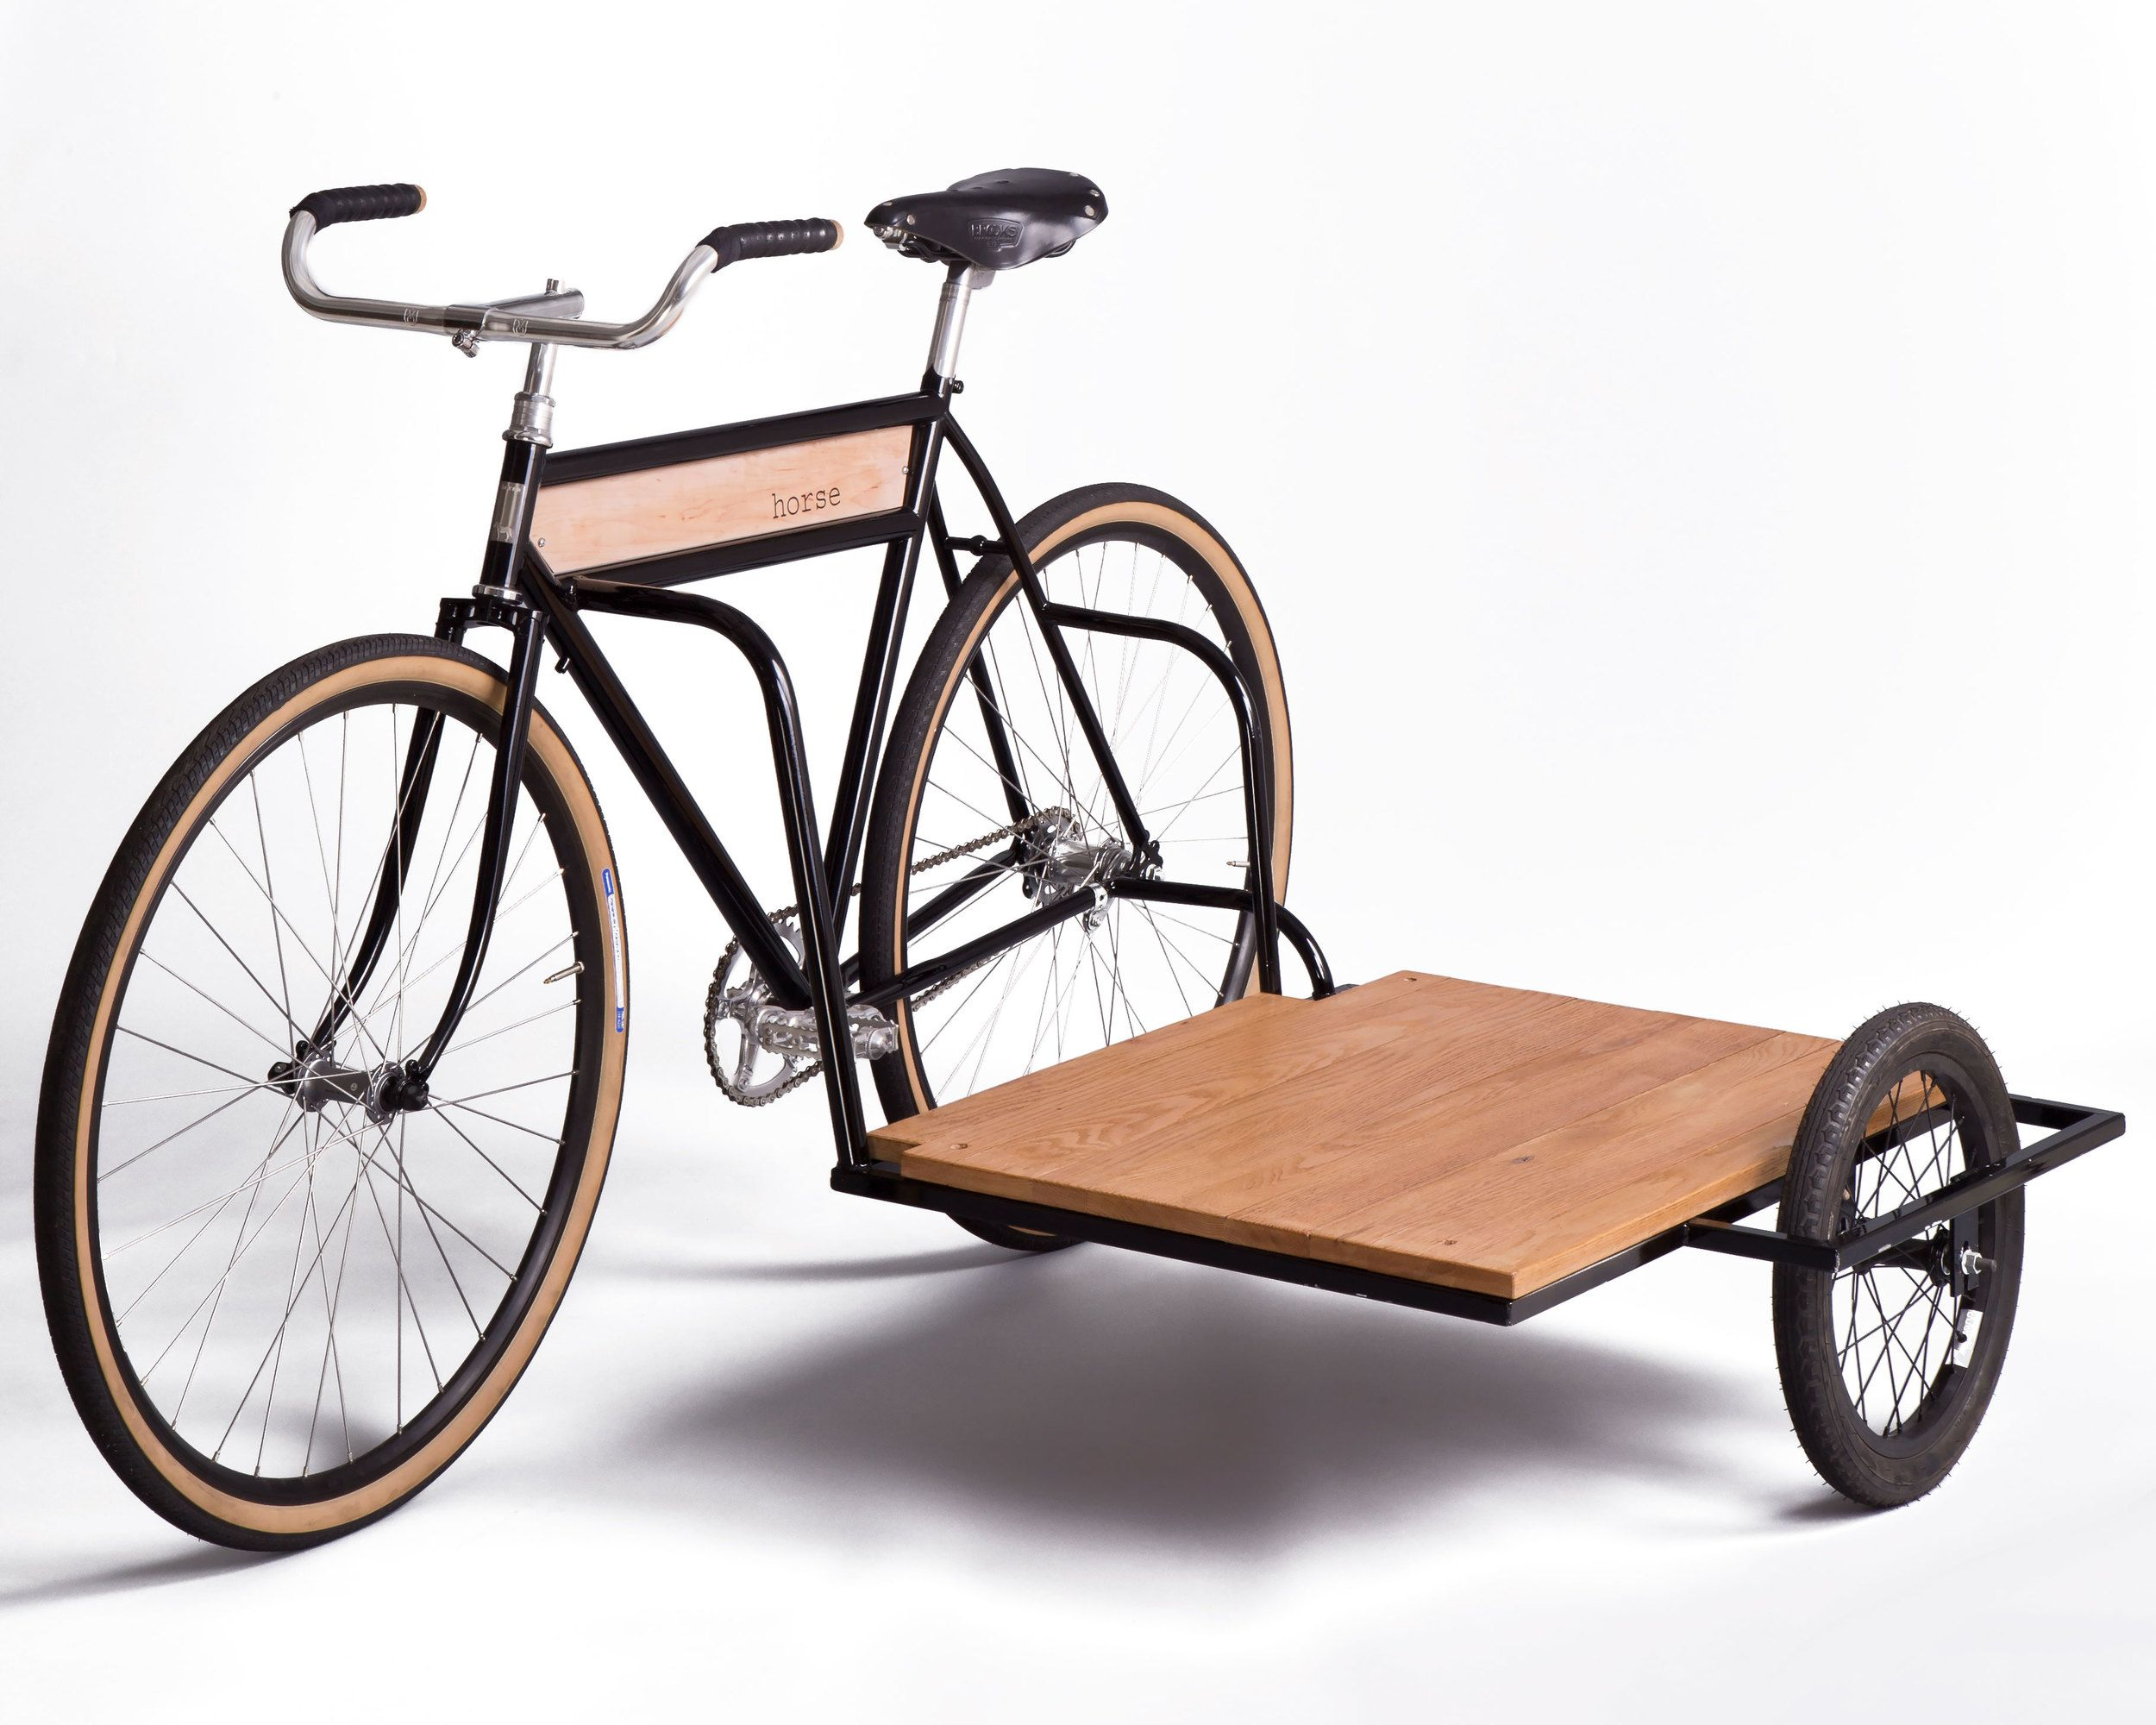 Sidecar 002 | Sidecar, Bicycling and Bike stuff